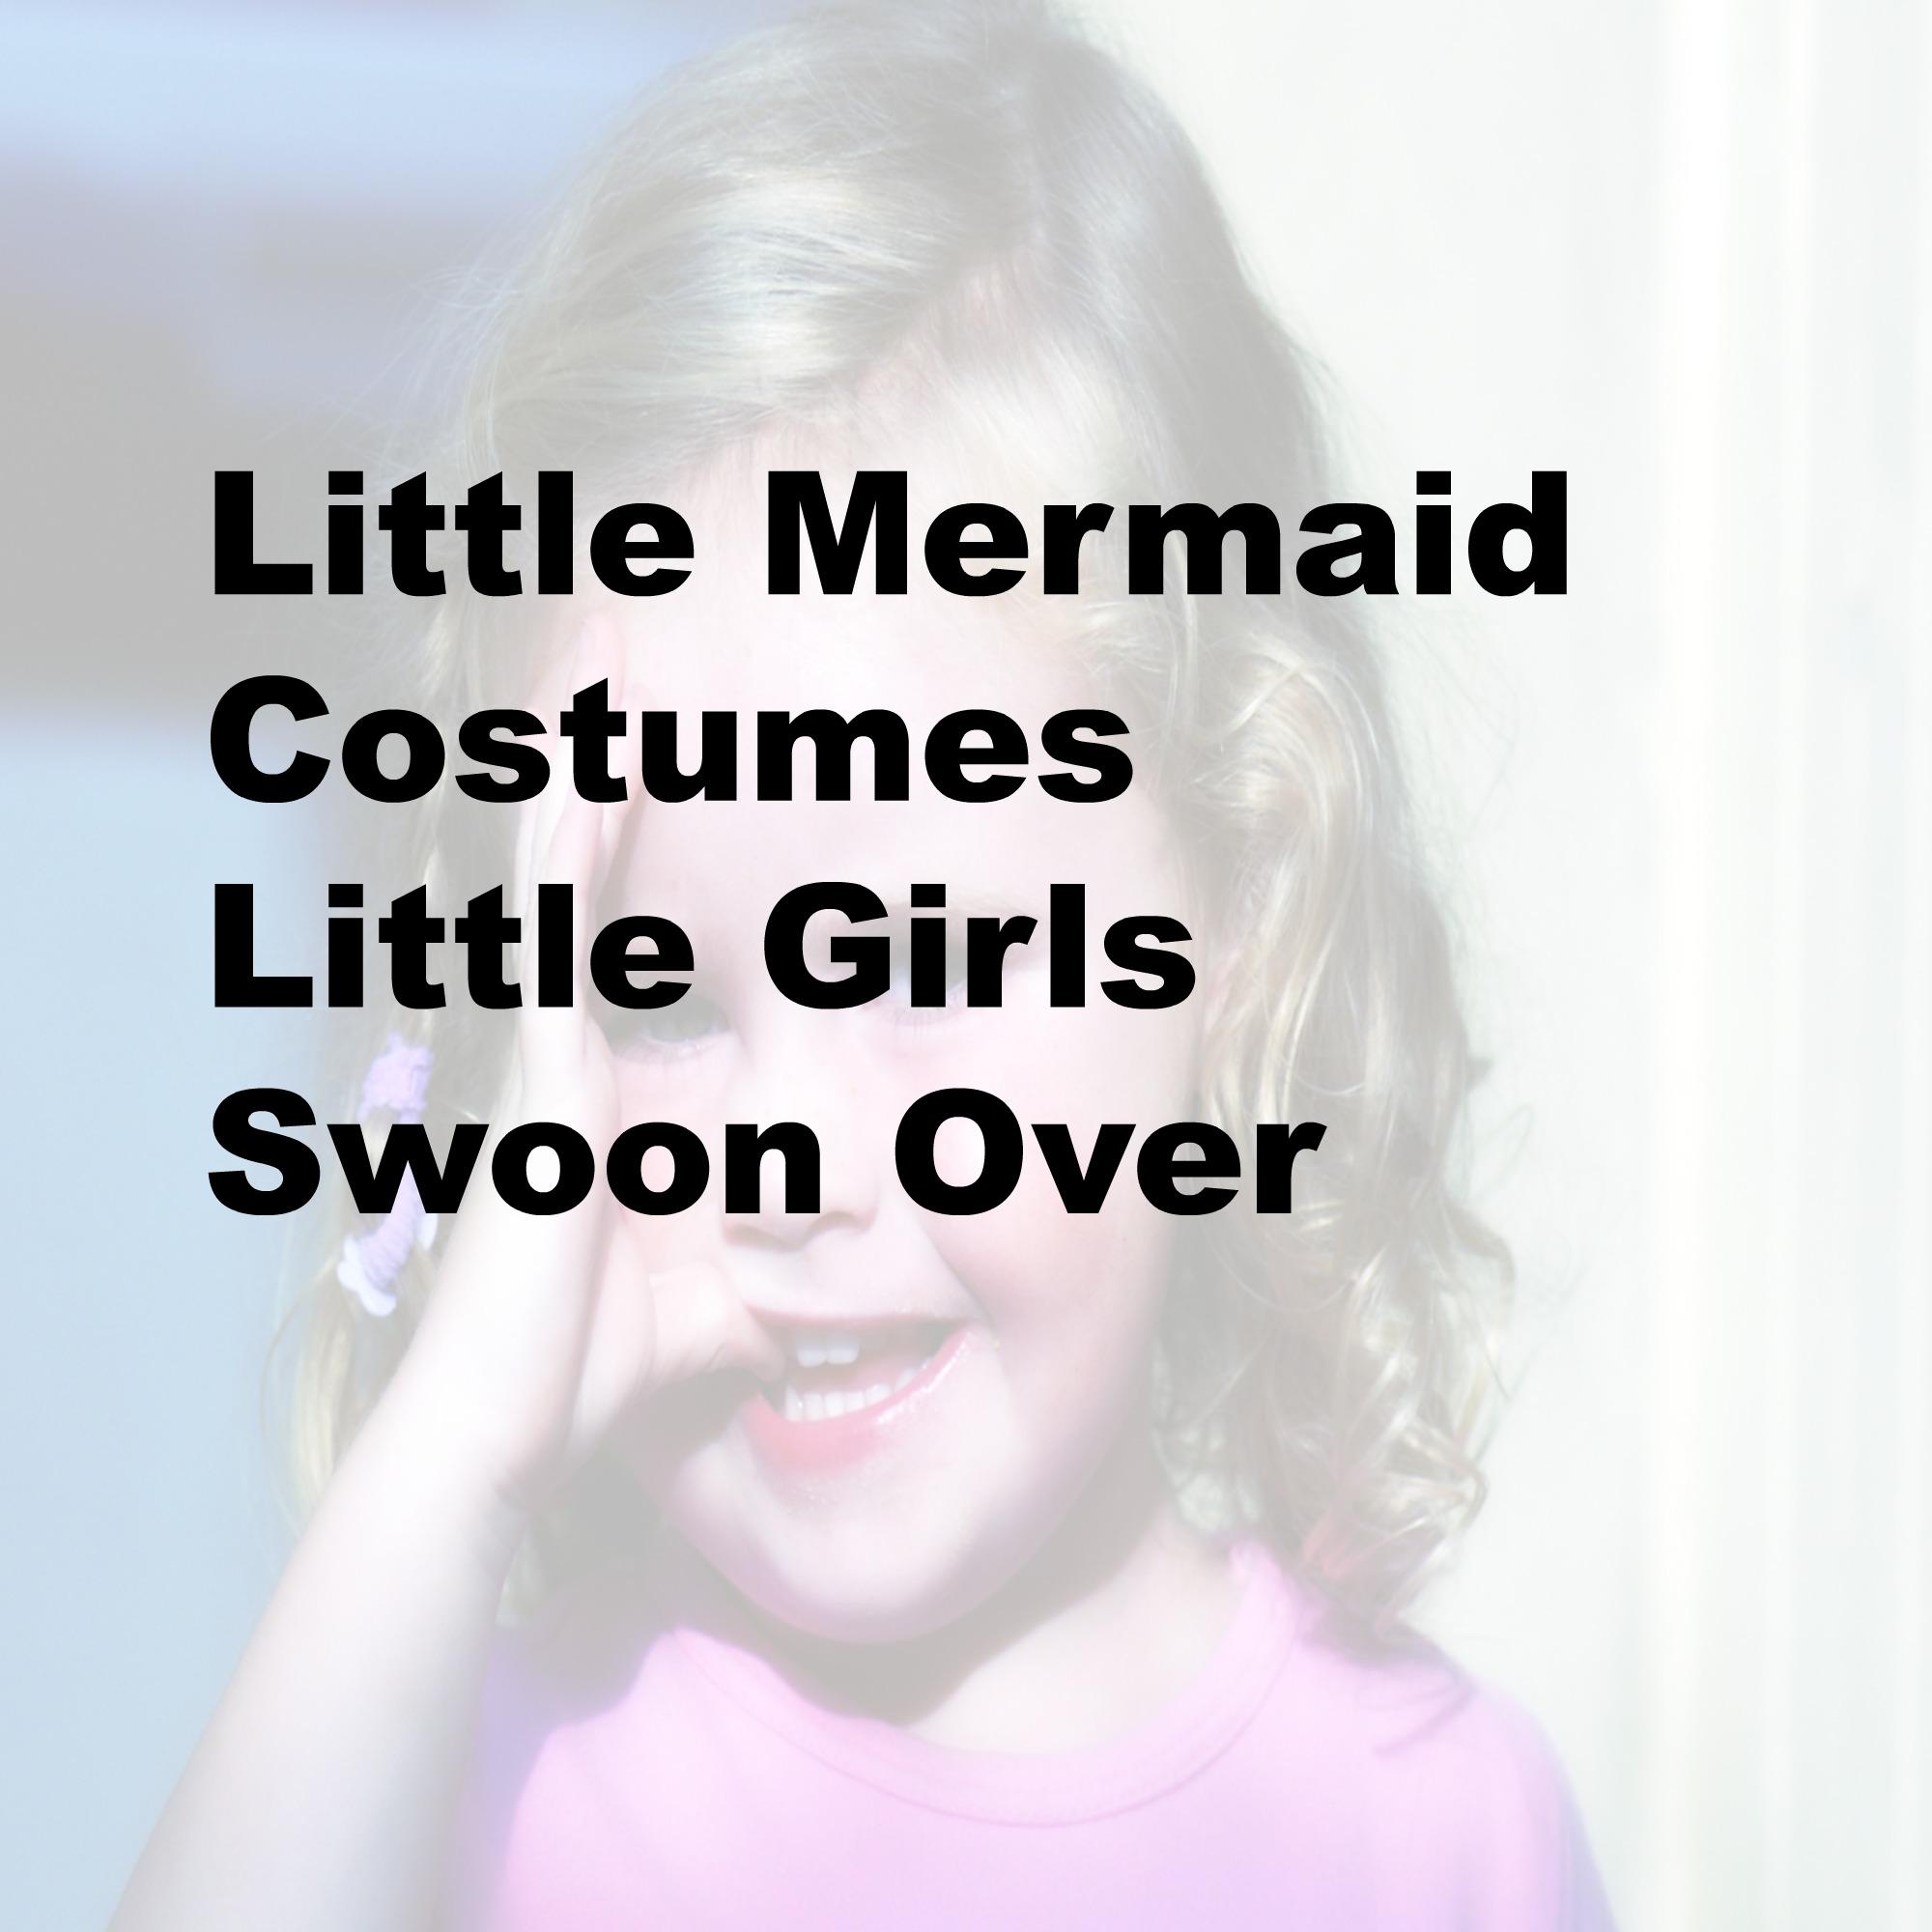 little mermaid costumes little girls